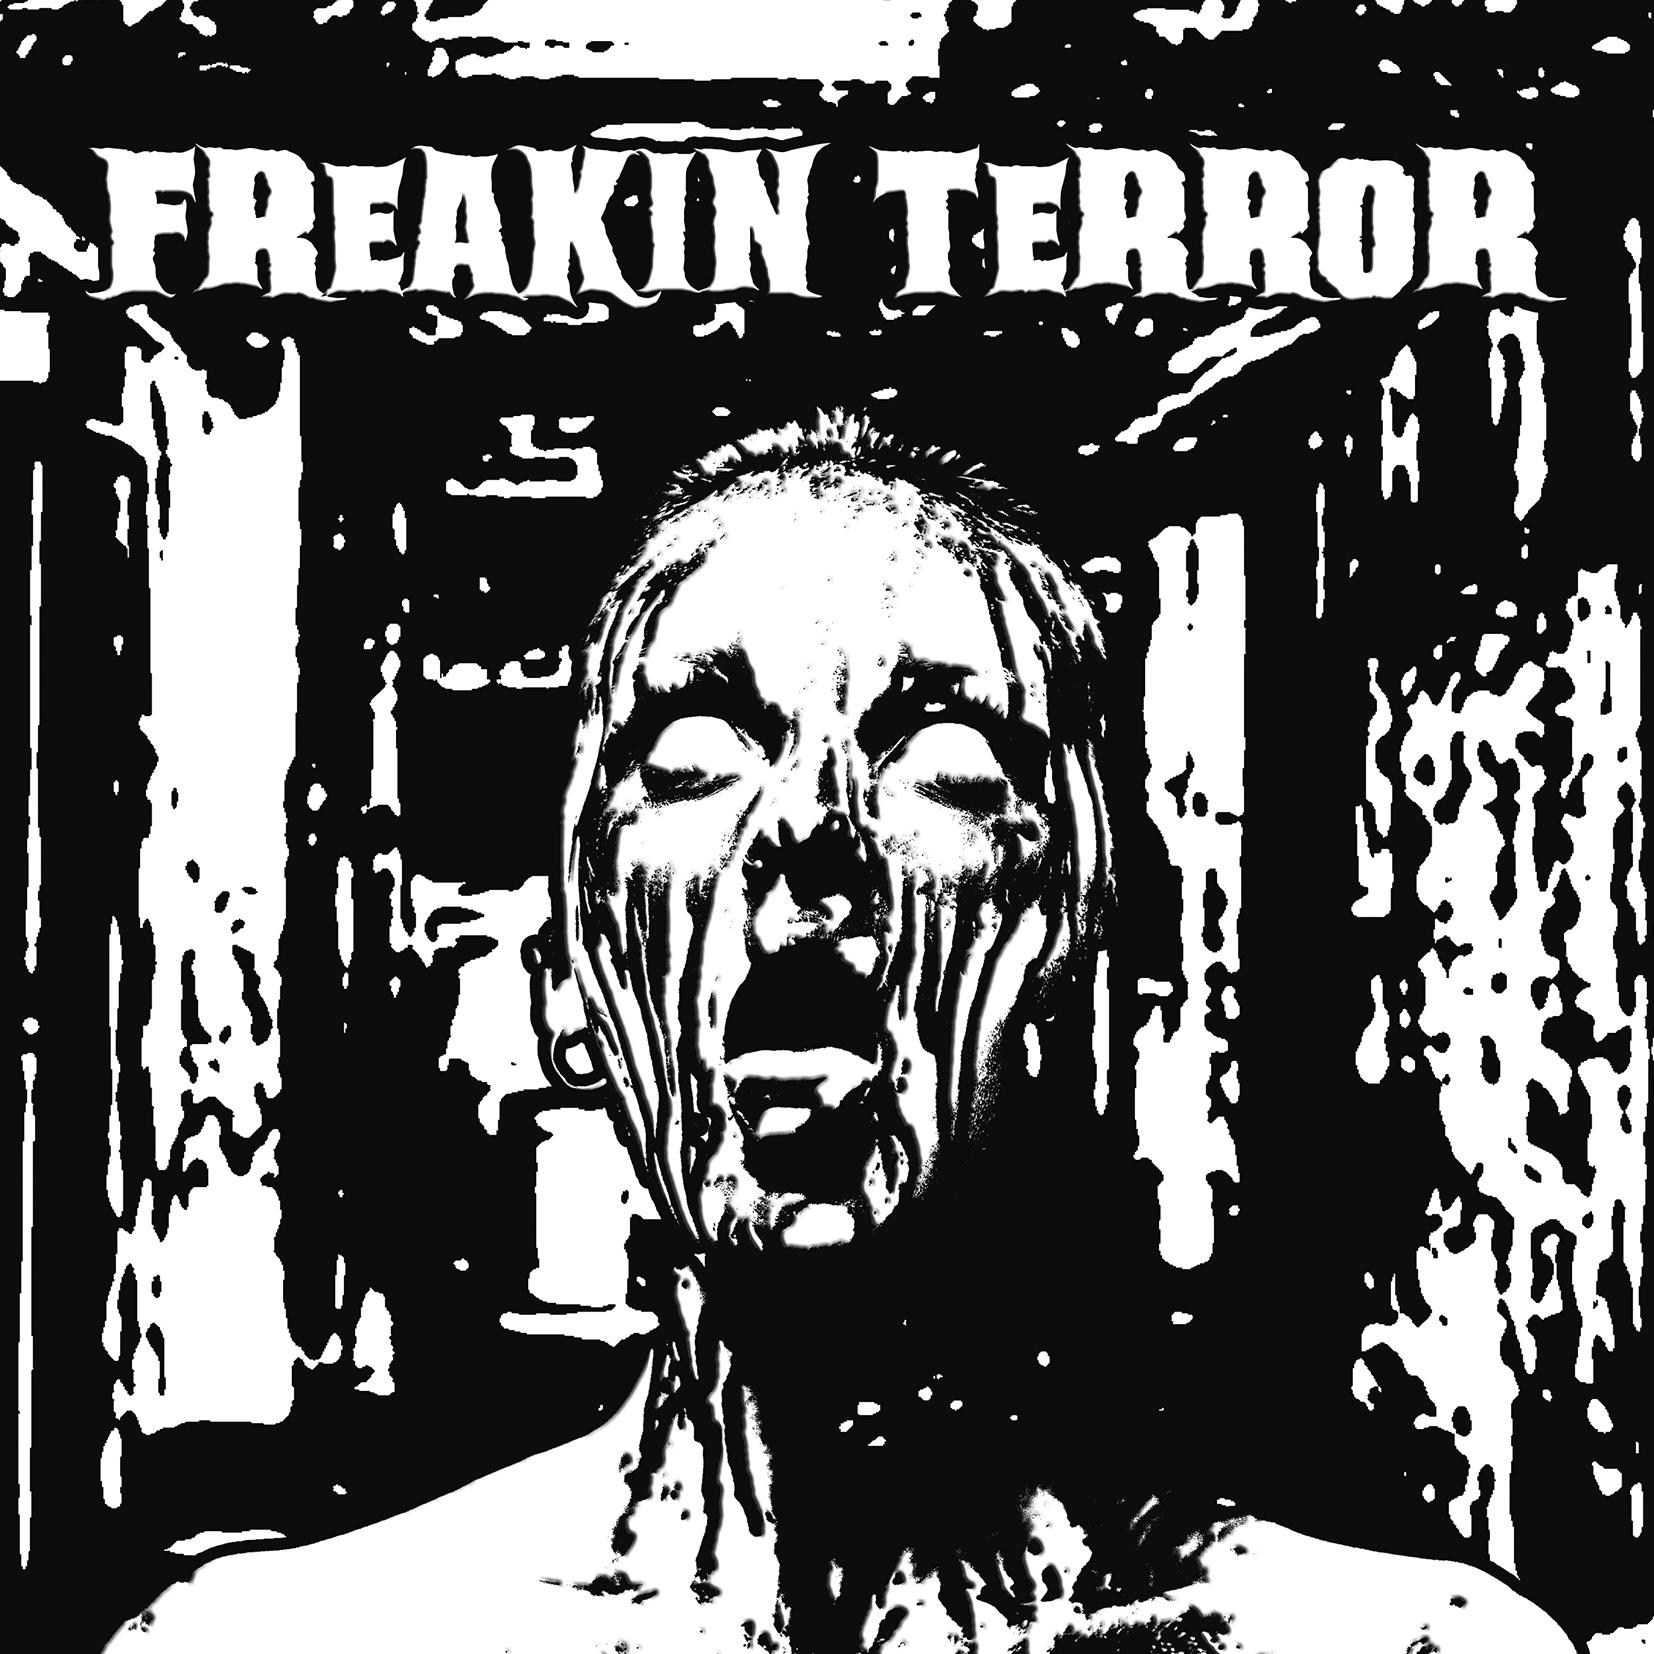 http://freakinworks.net/FKWEX002/img/jacket.jpg